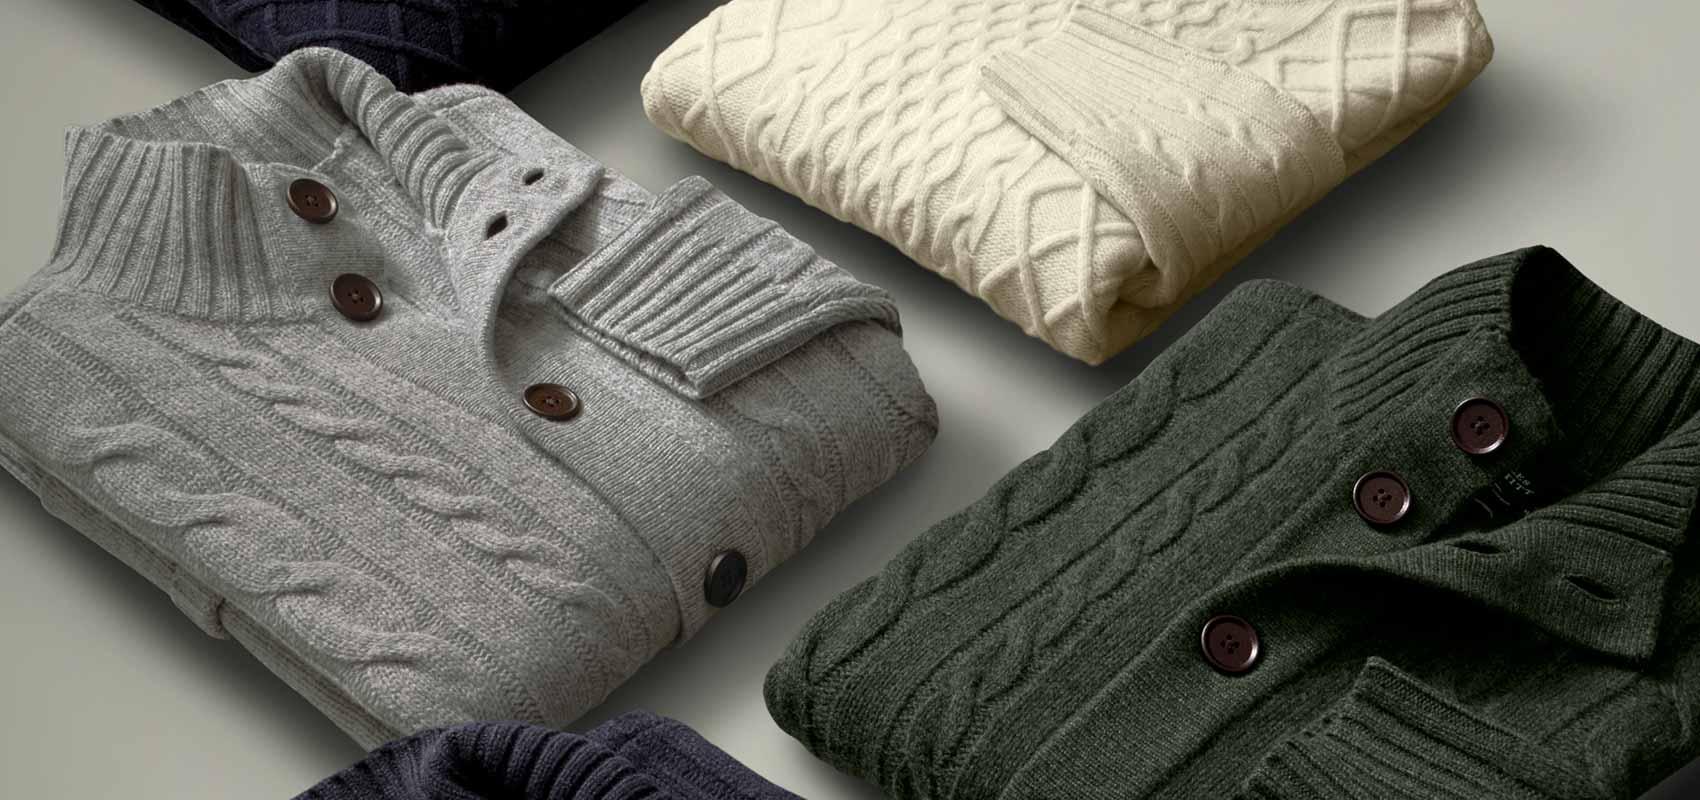 Charles Tyrwhitt chunky knitwear